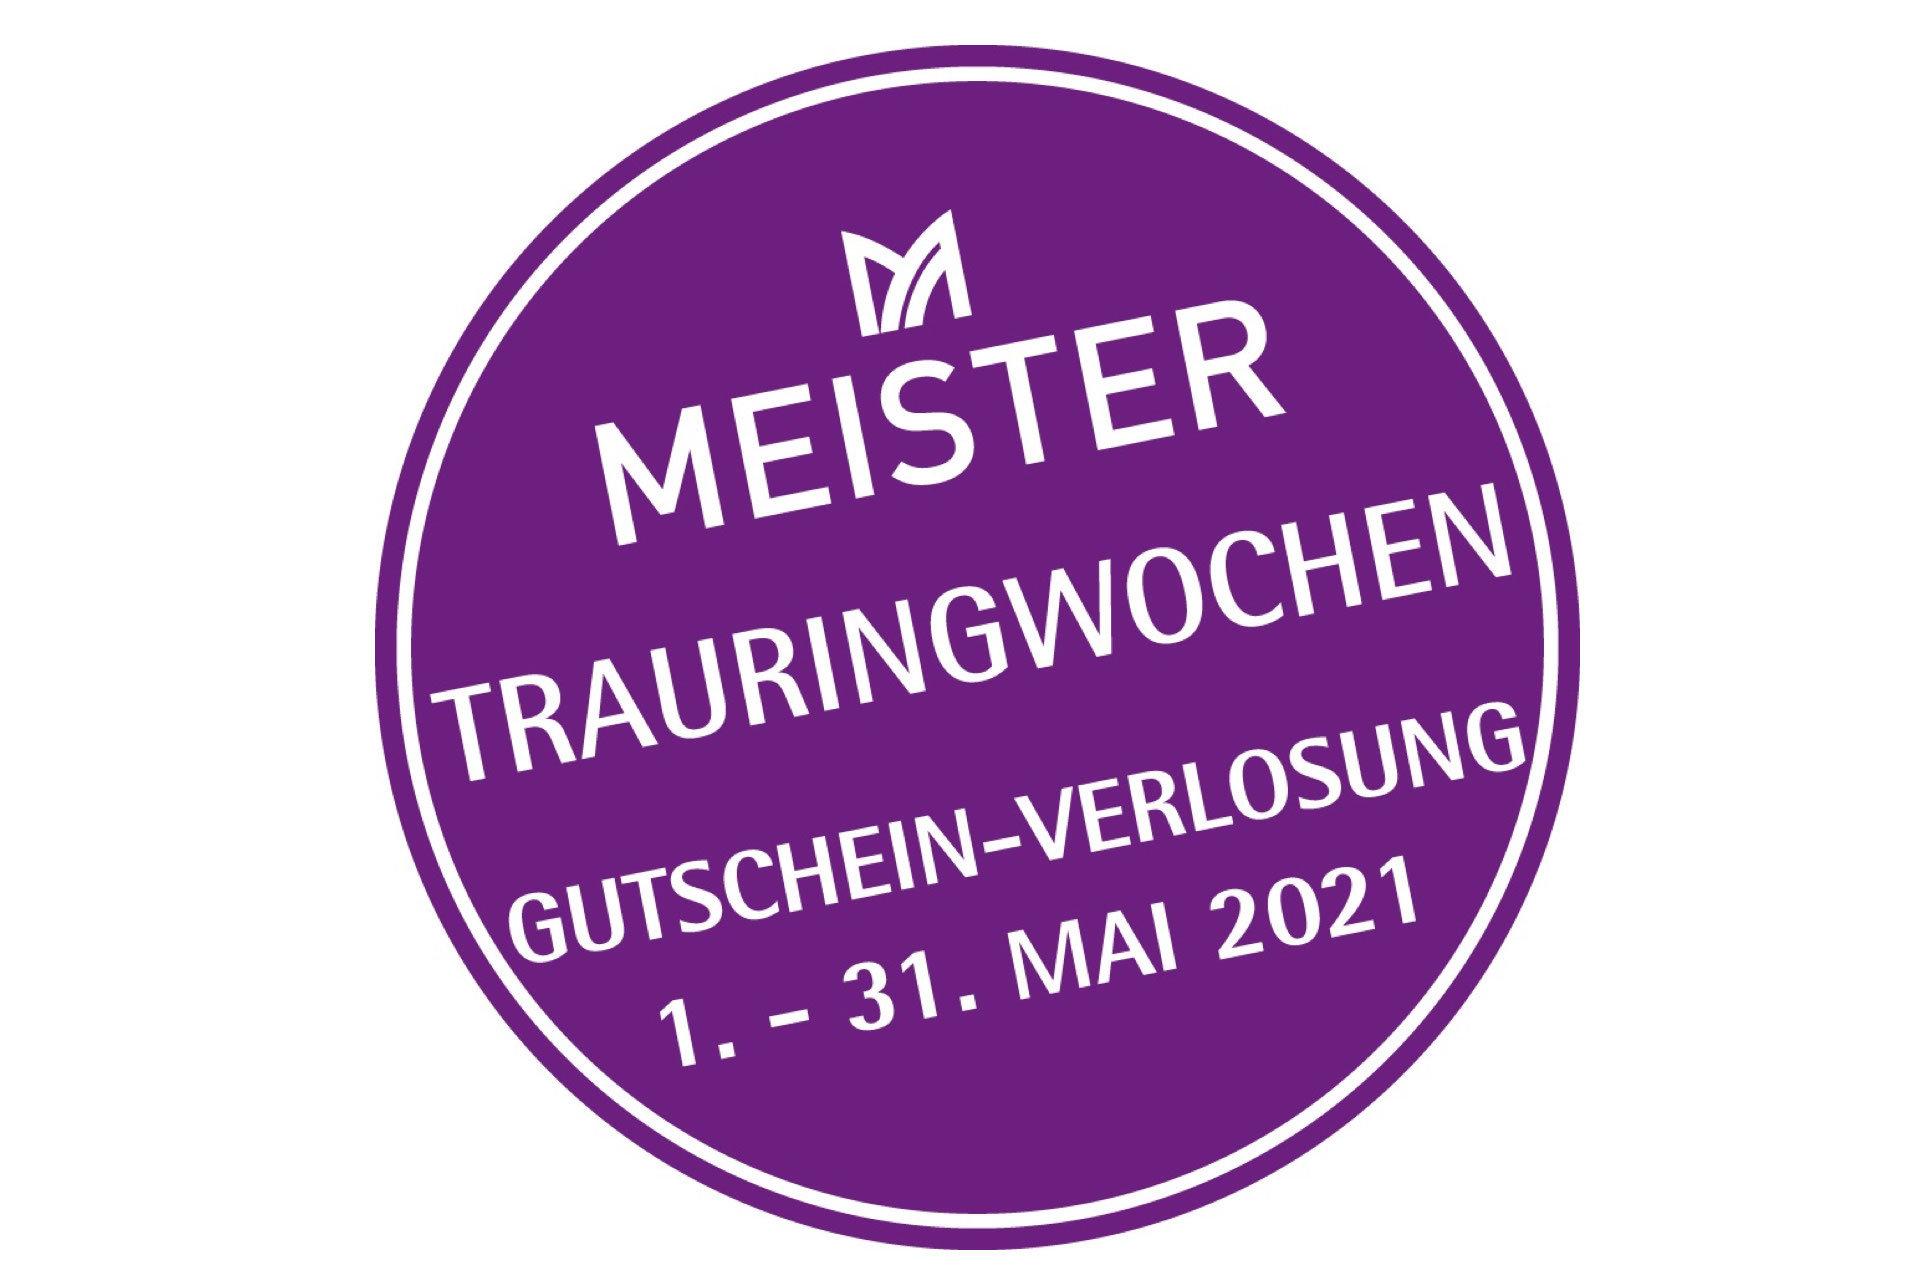 Meister Trauringwochen 2021